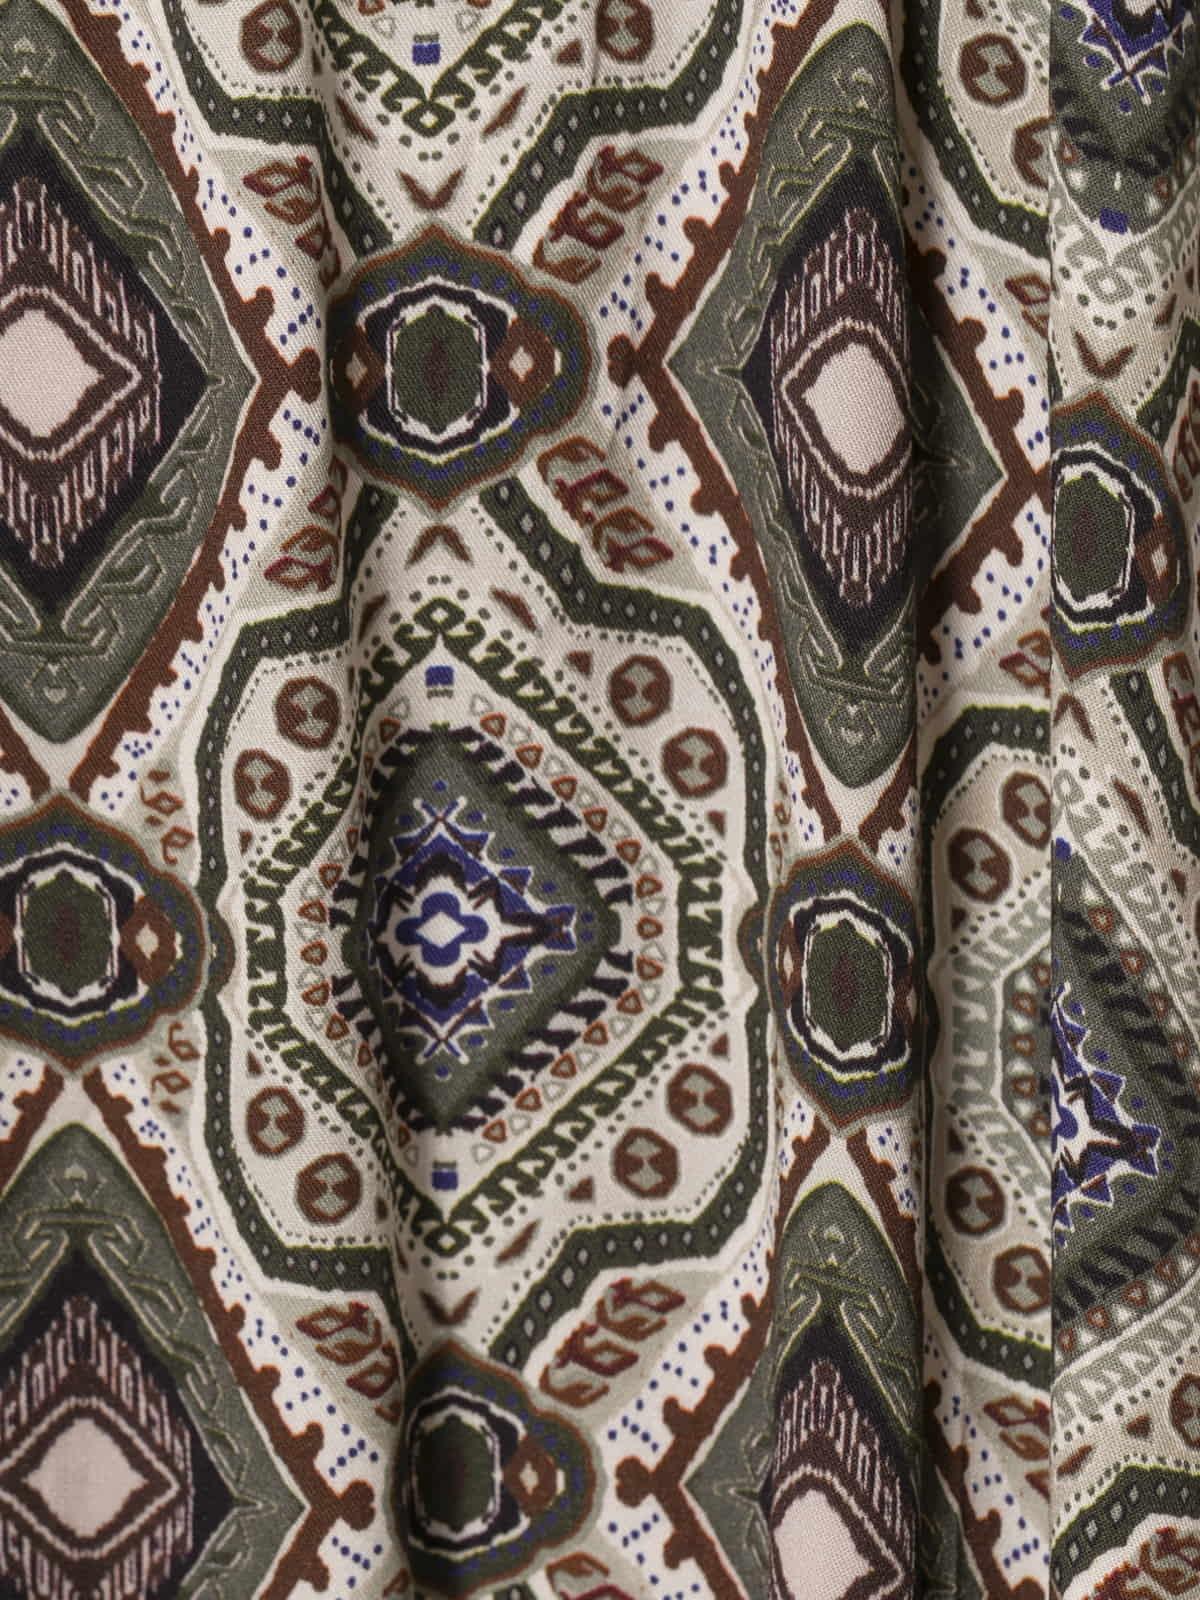 Woman V-neck print dress Khaki